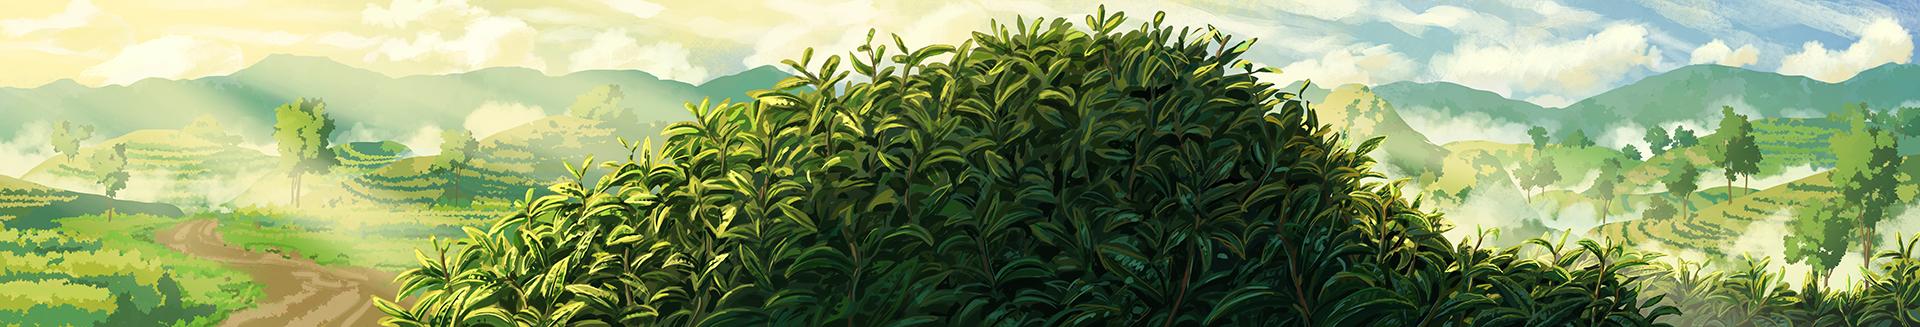 Go Go Tea: Landscape